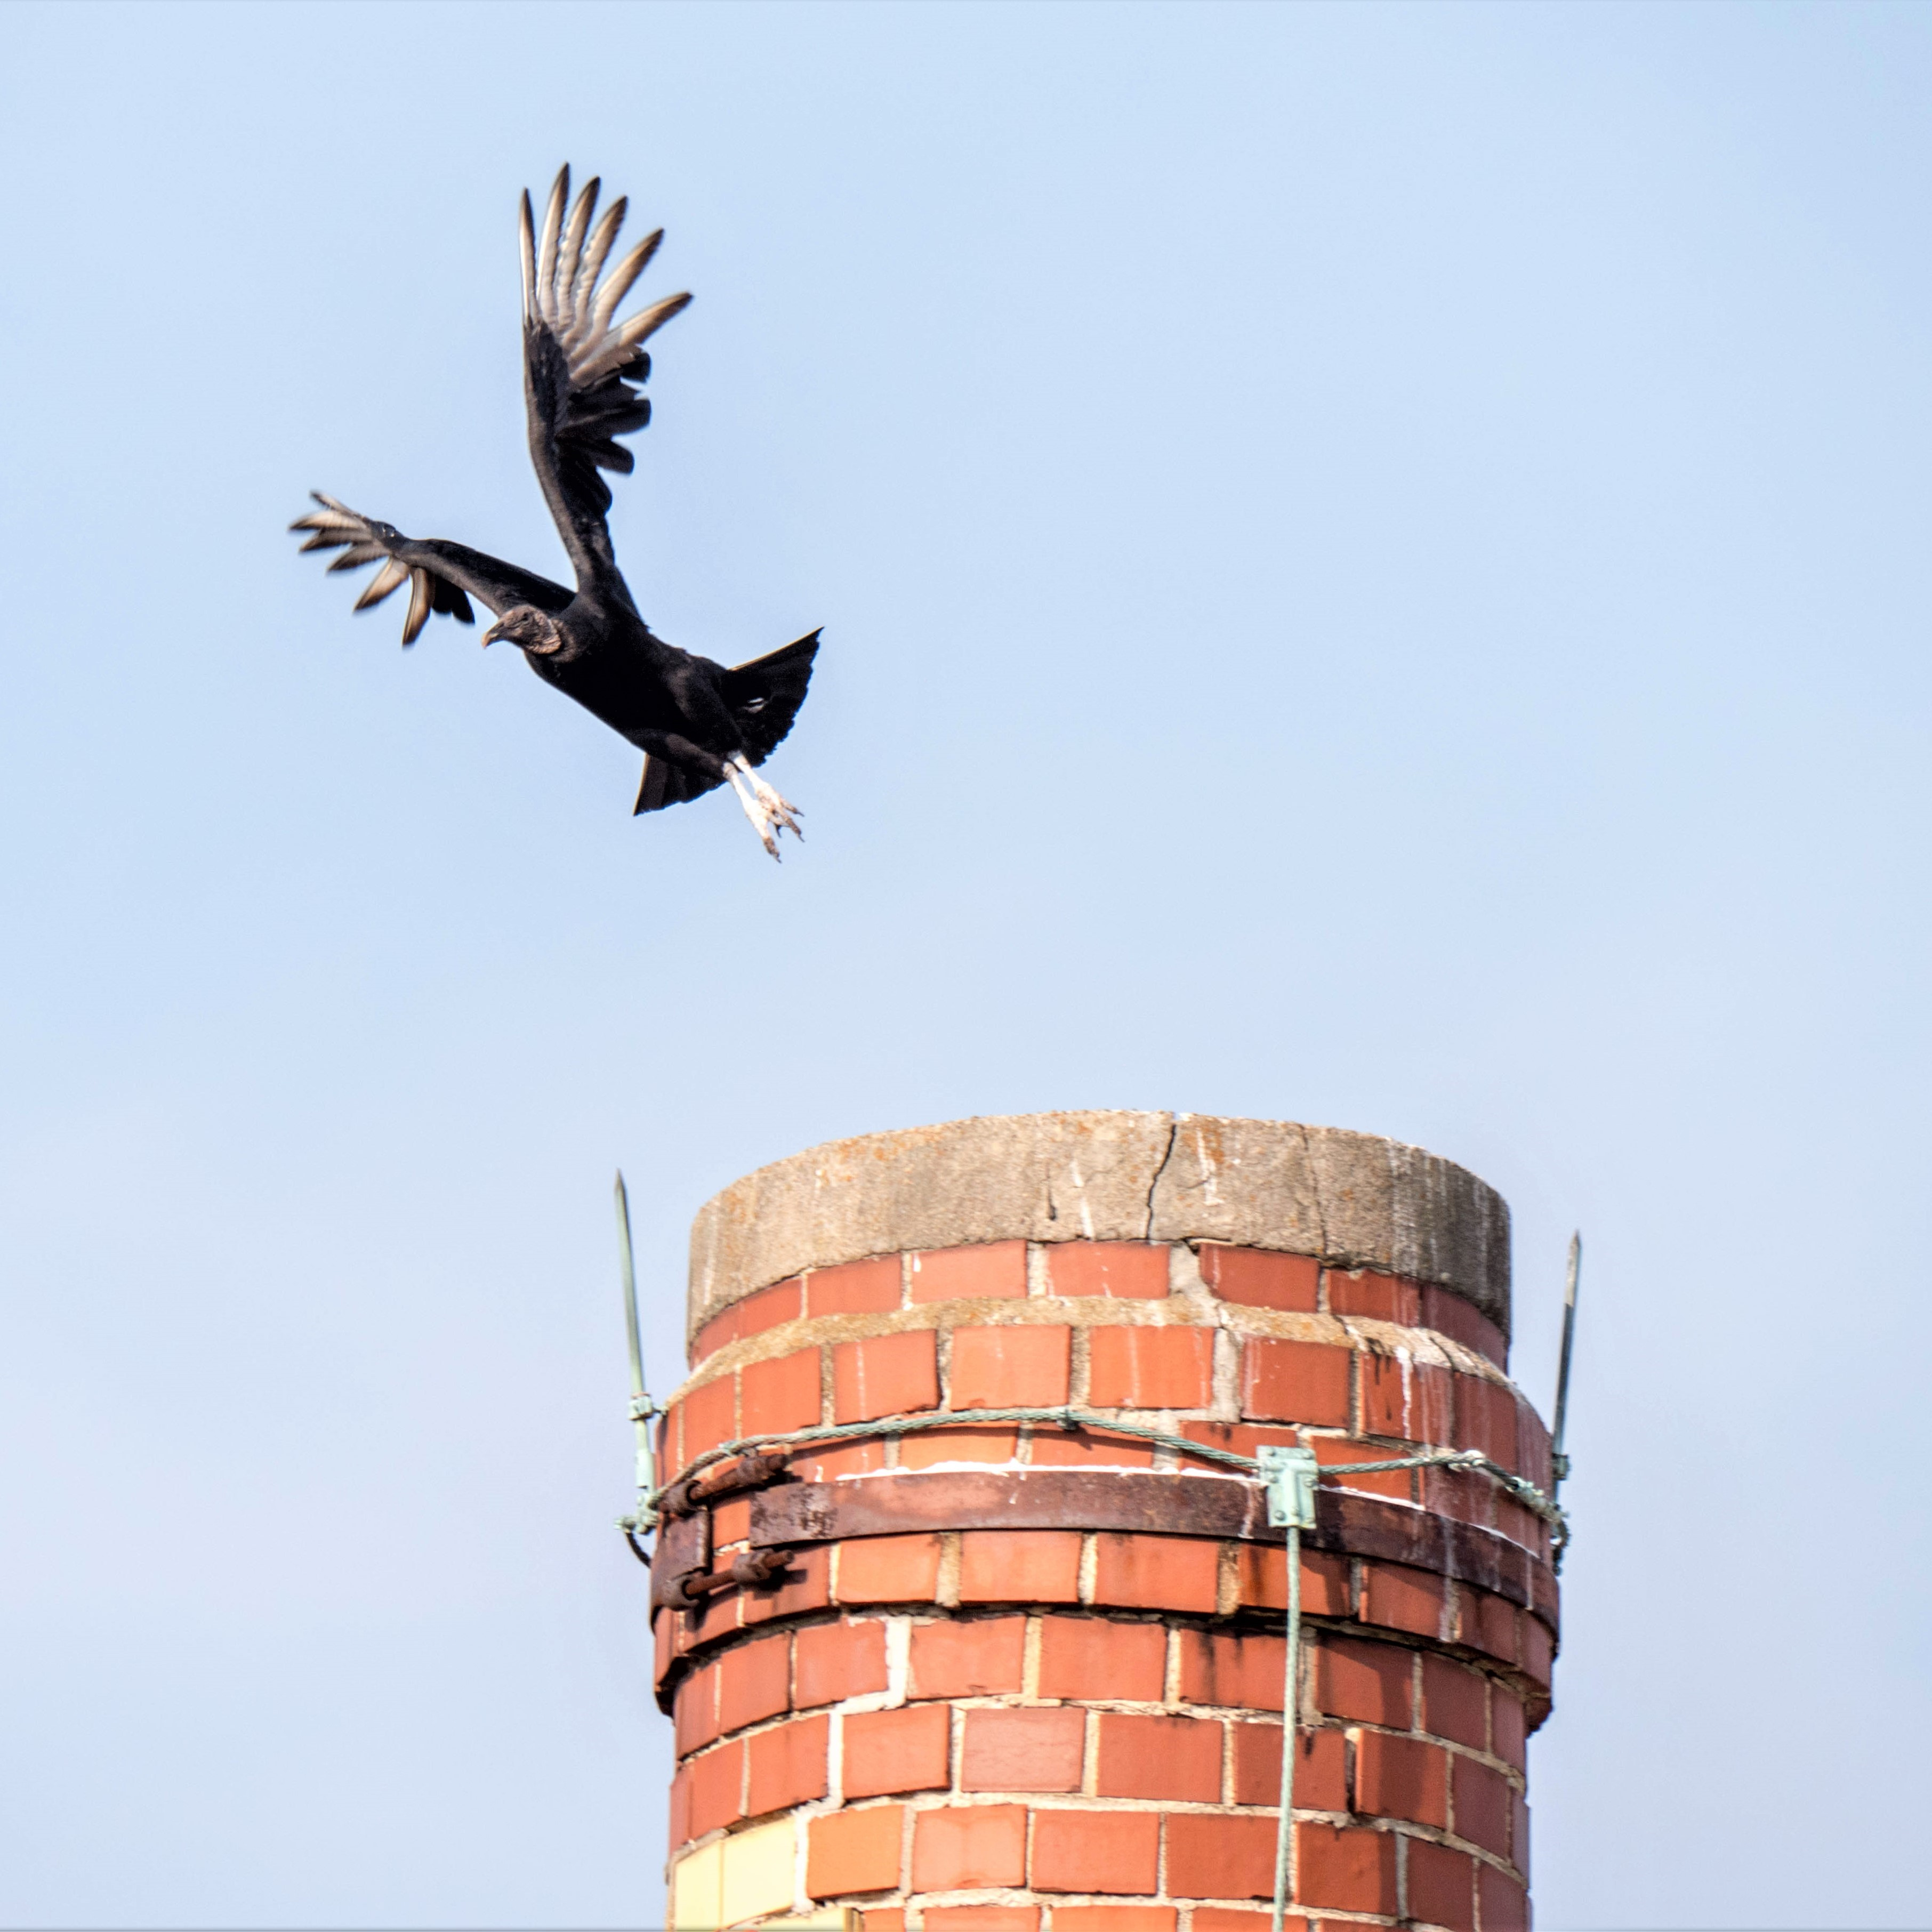 FPNL CdCC turkey vulture square